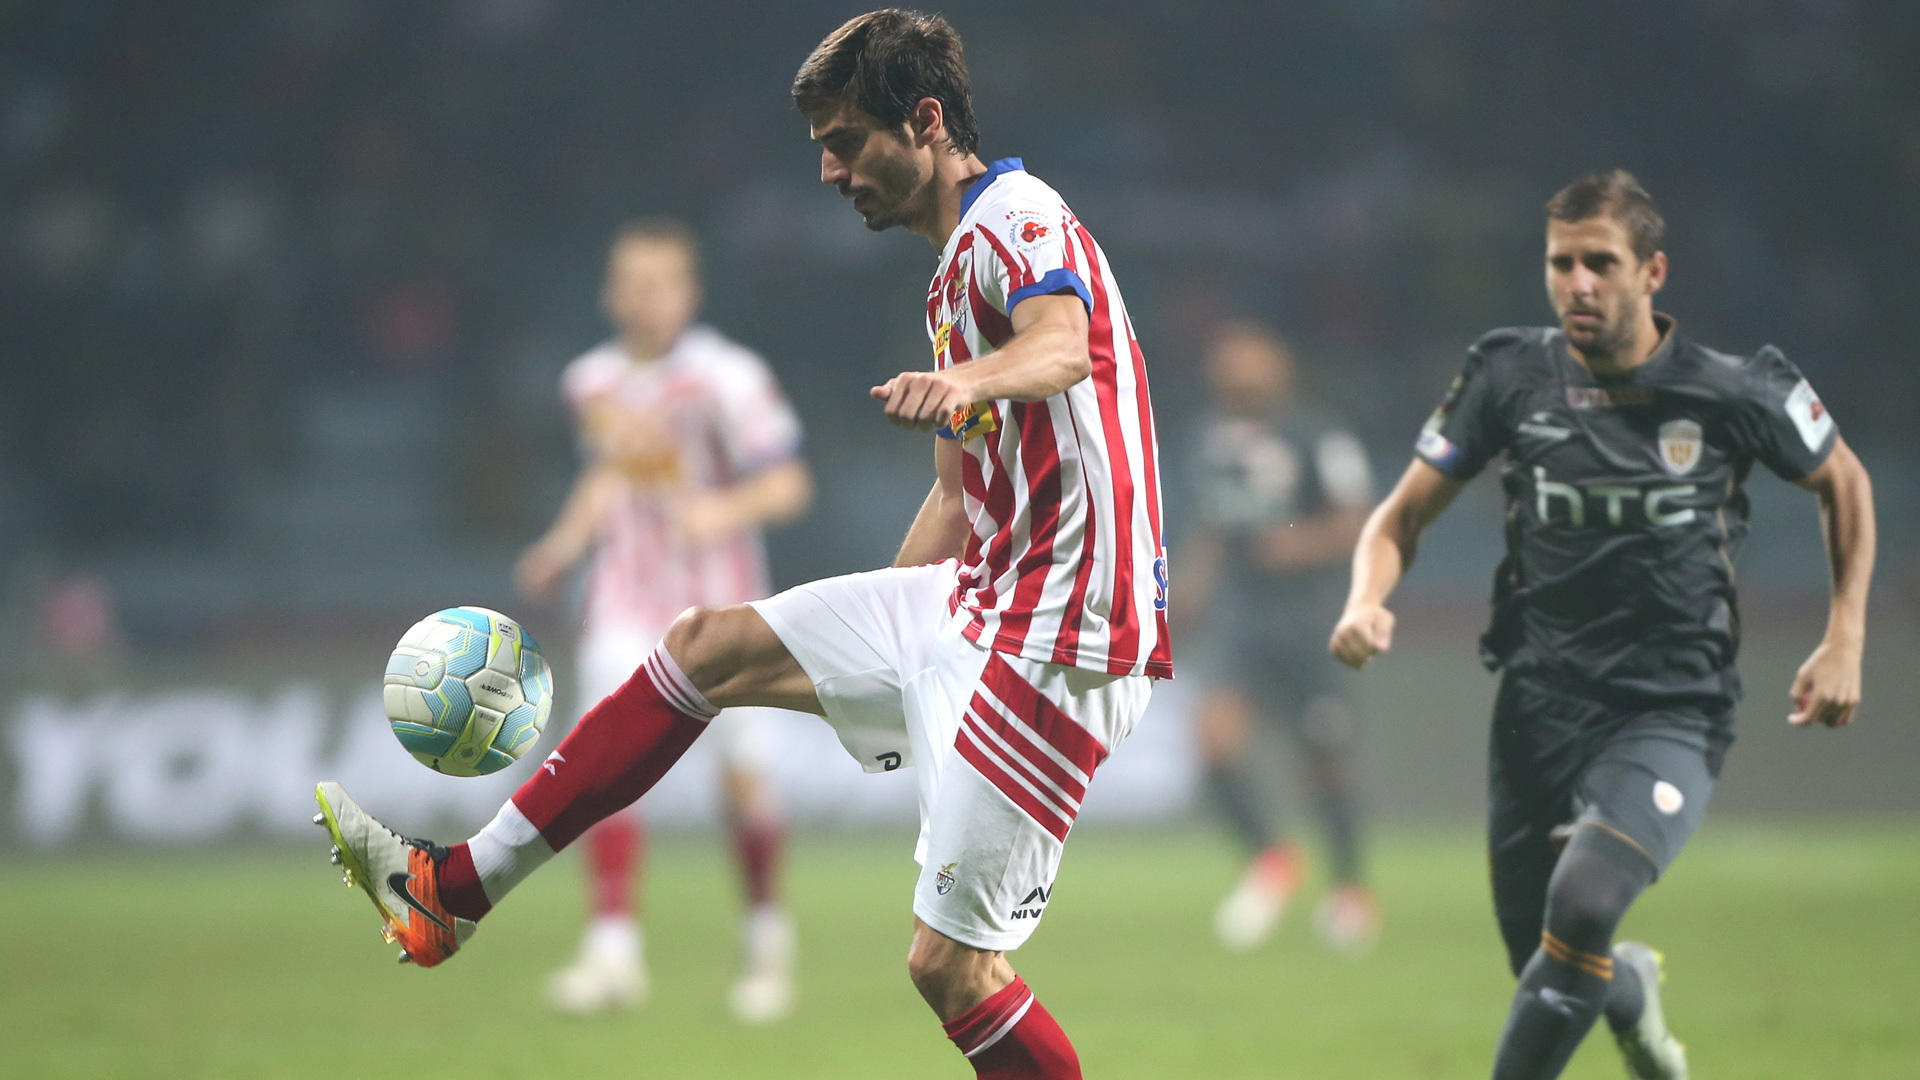 Henrique Sereno Atletico de Kolkata NorthEast United FC ISL season 3 2016